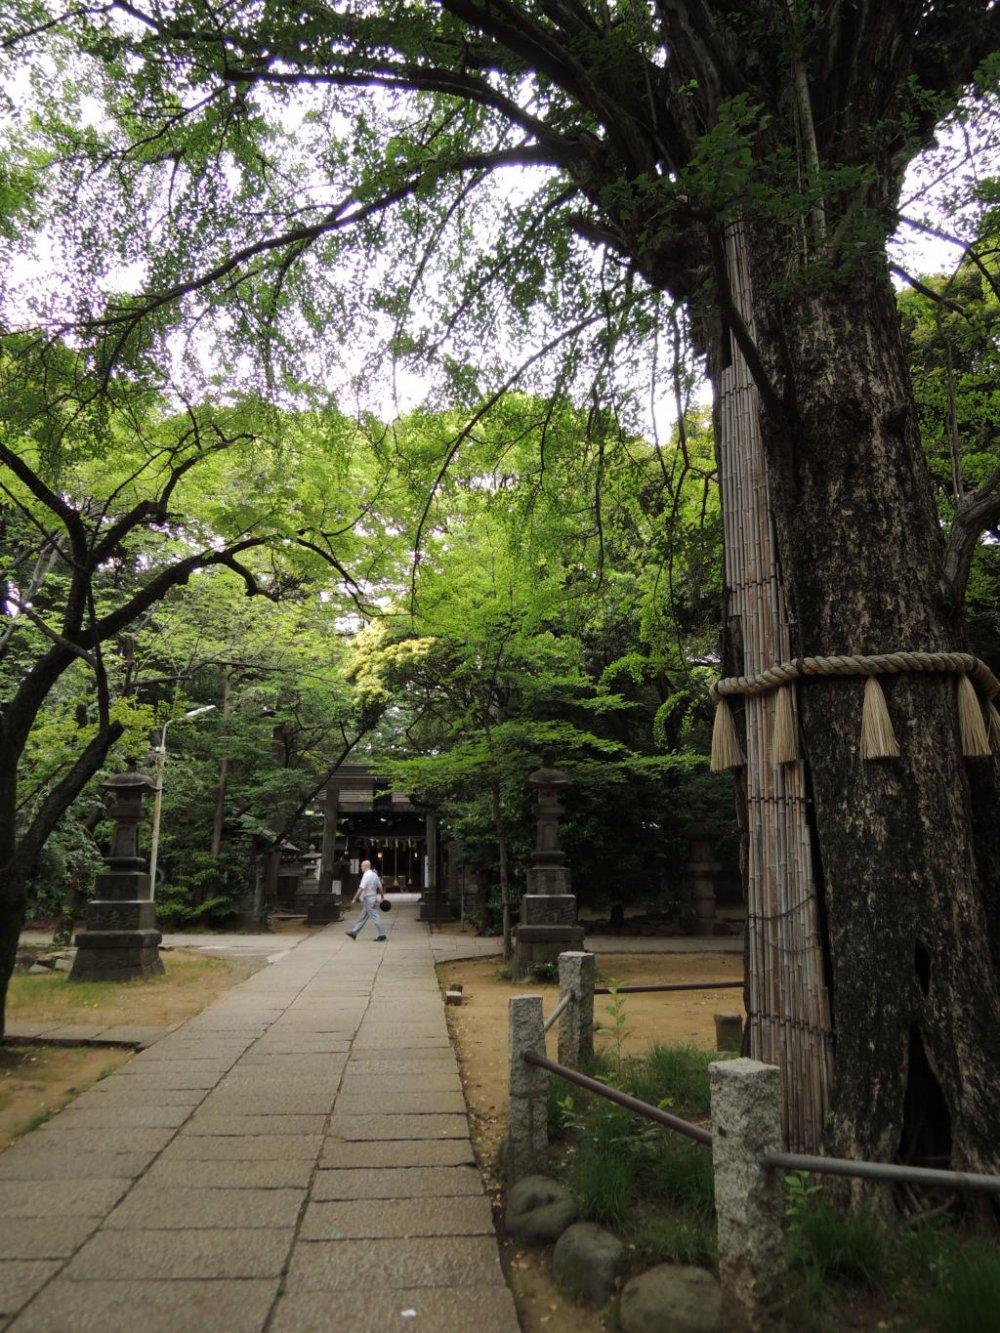 400 year old tree of Hikawa Shrine